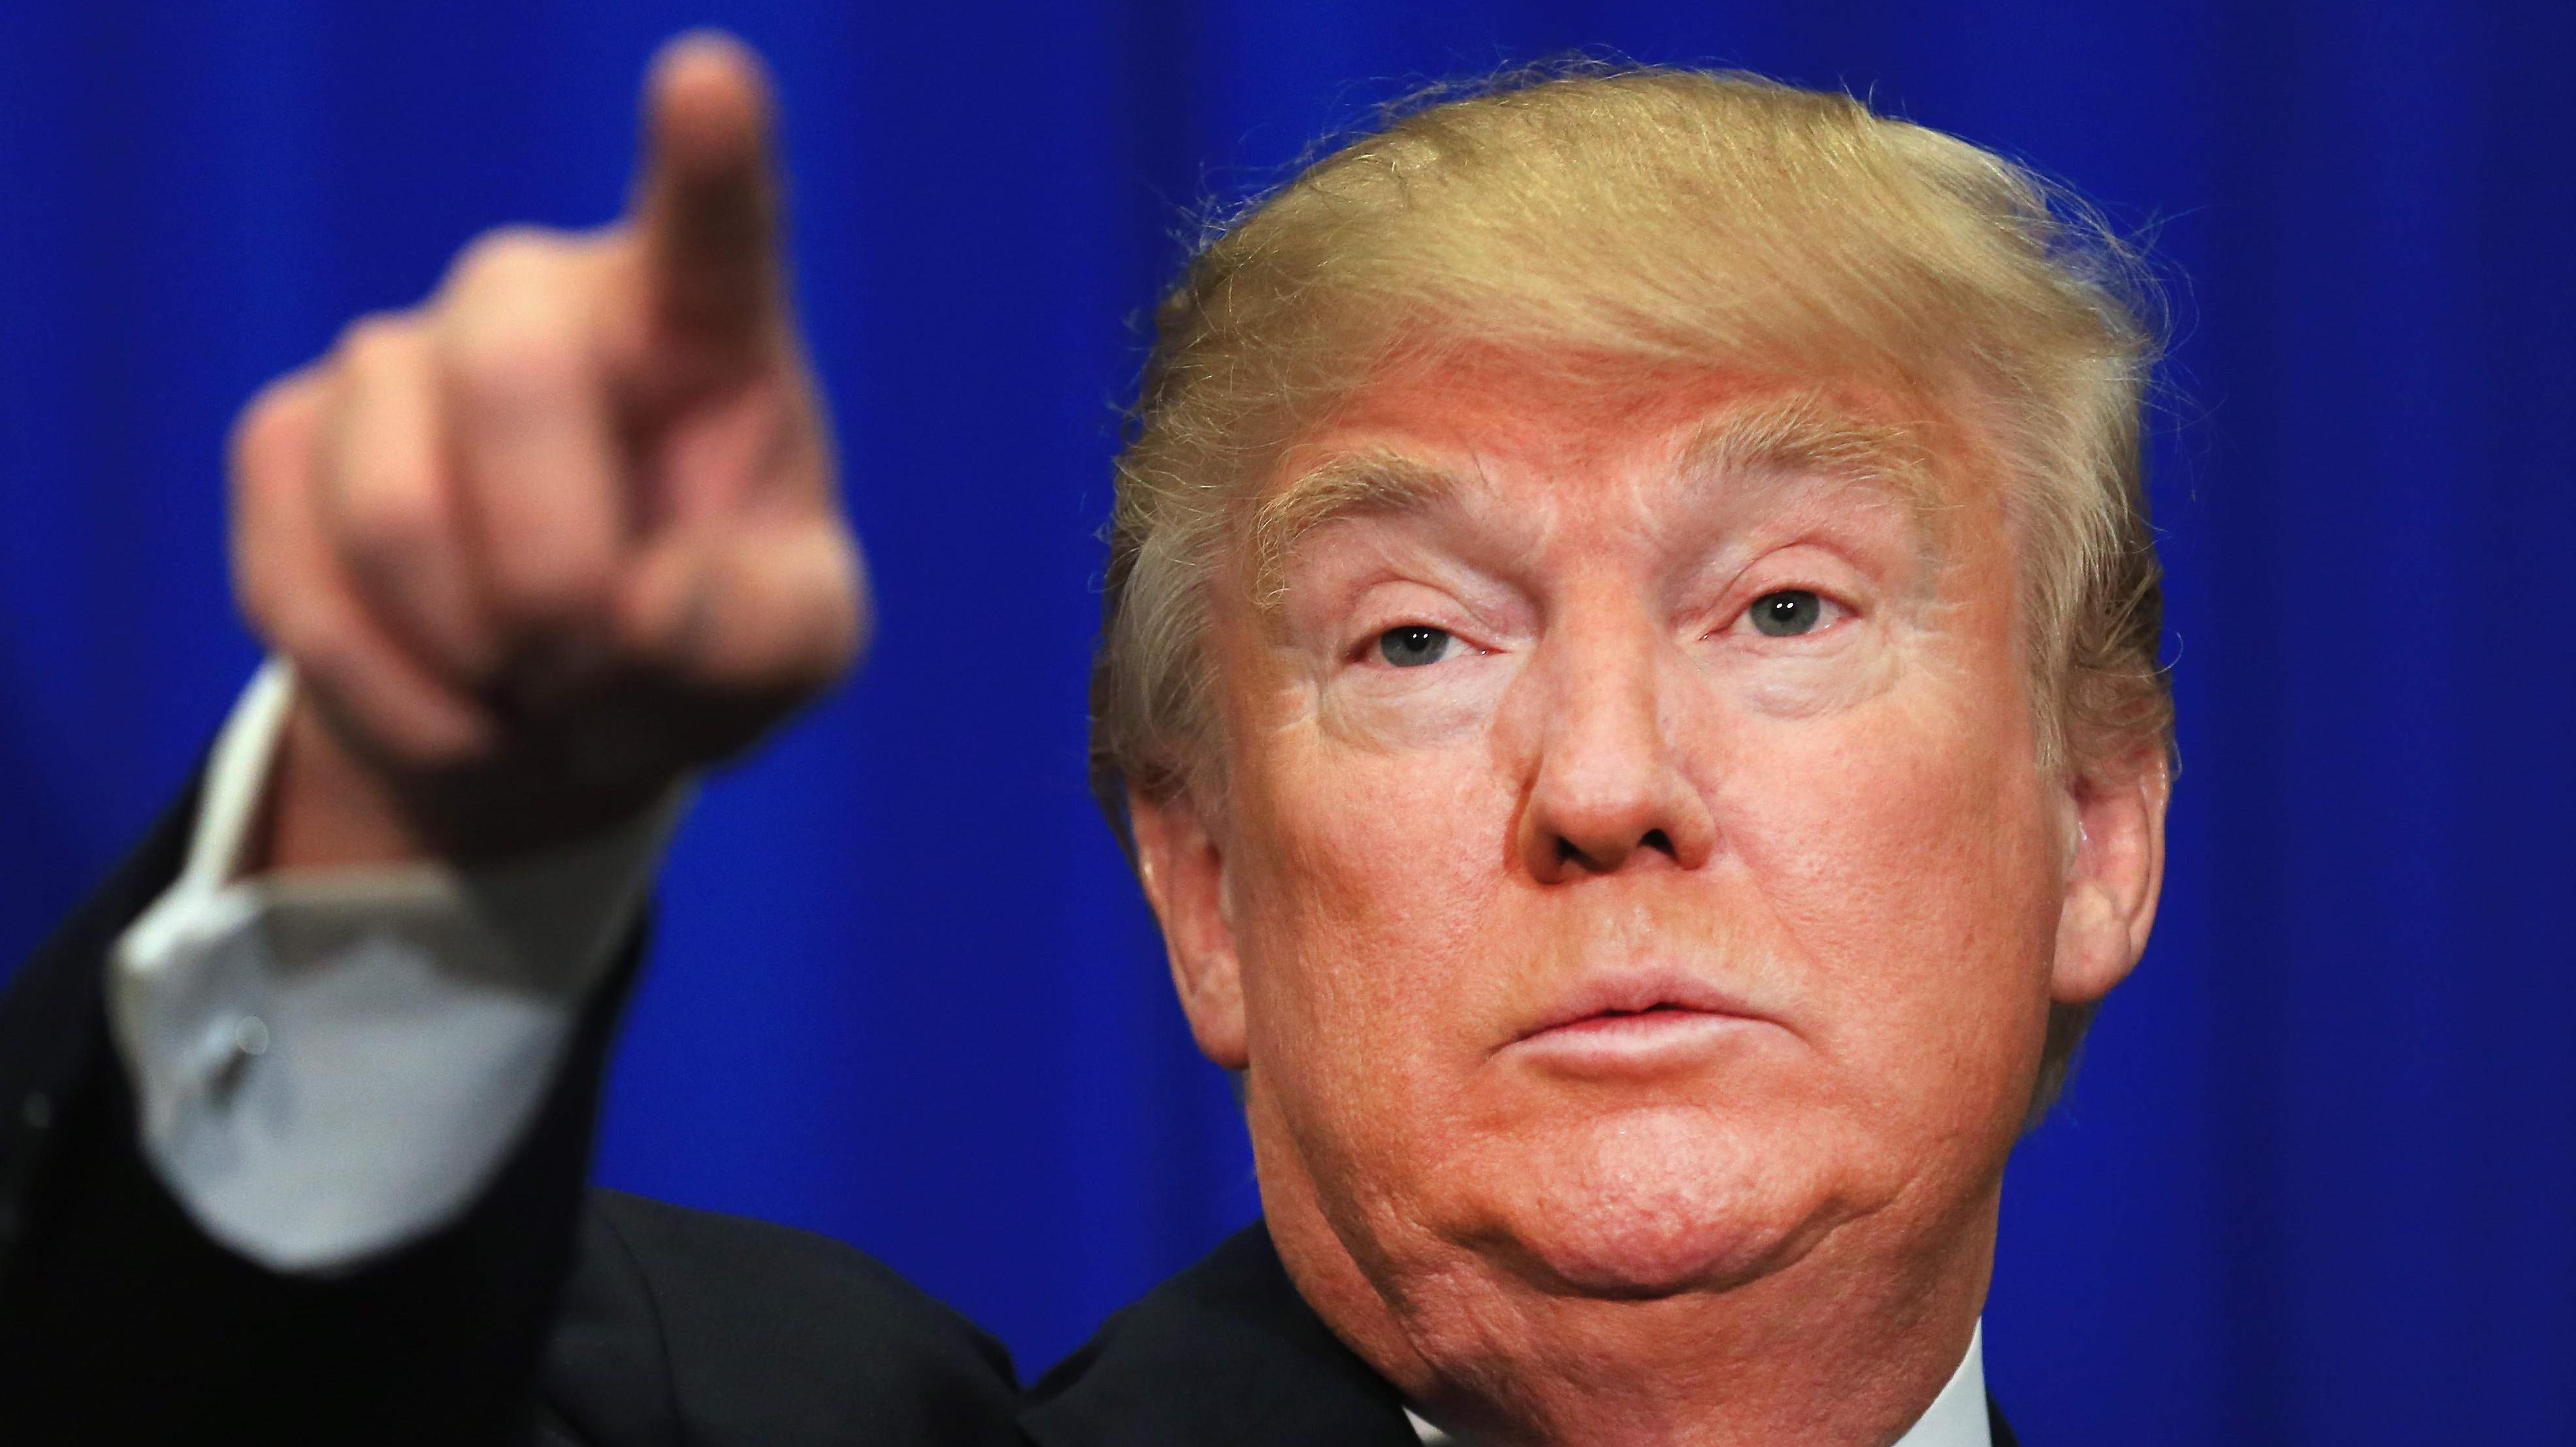 Donald Trump, KKK, David Duke